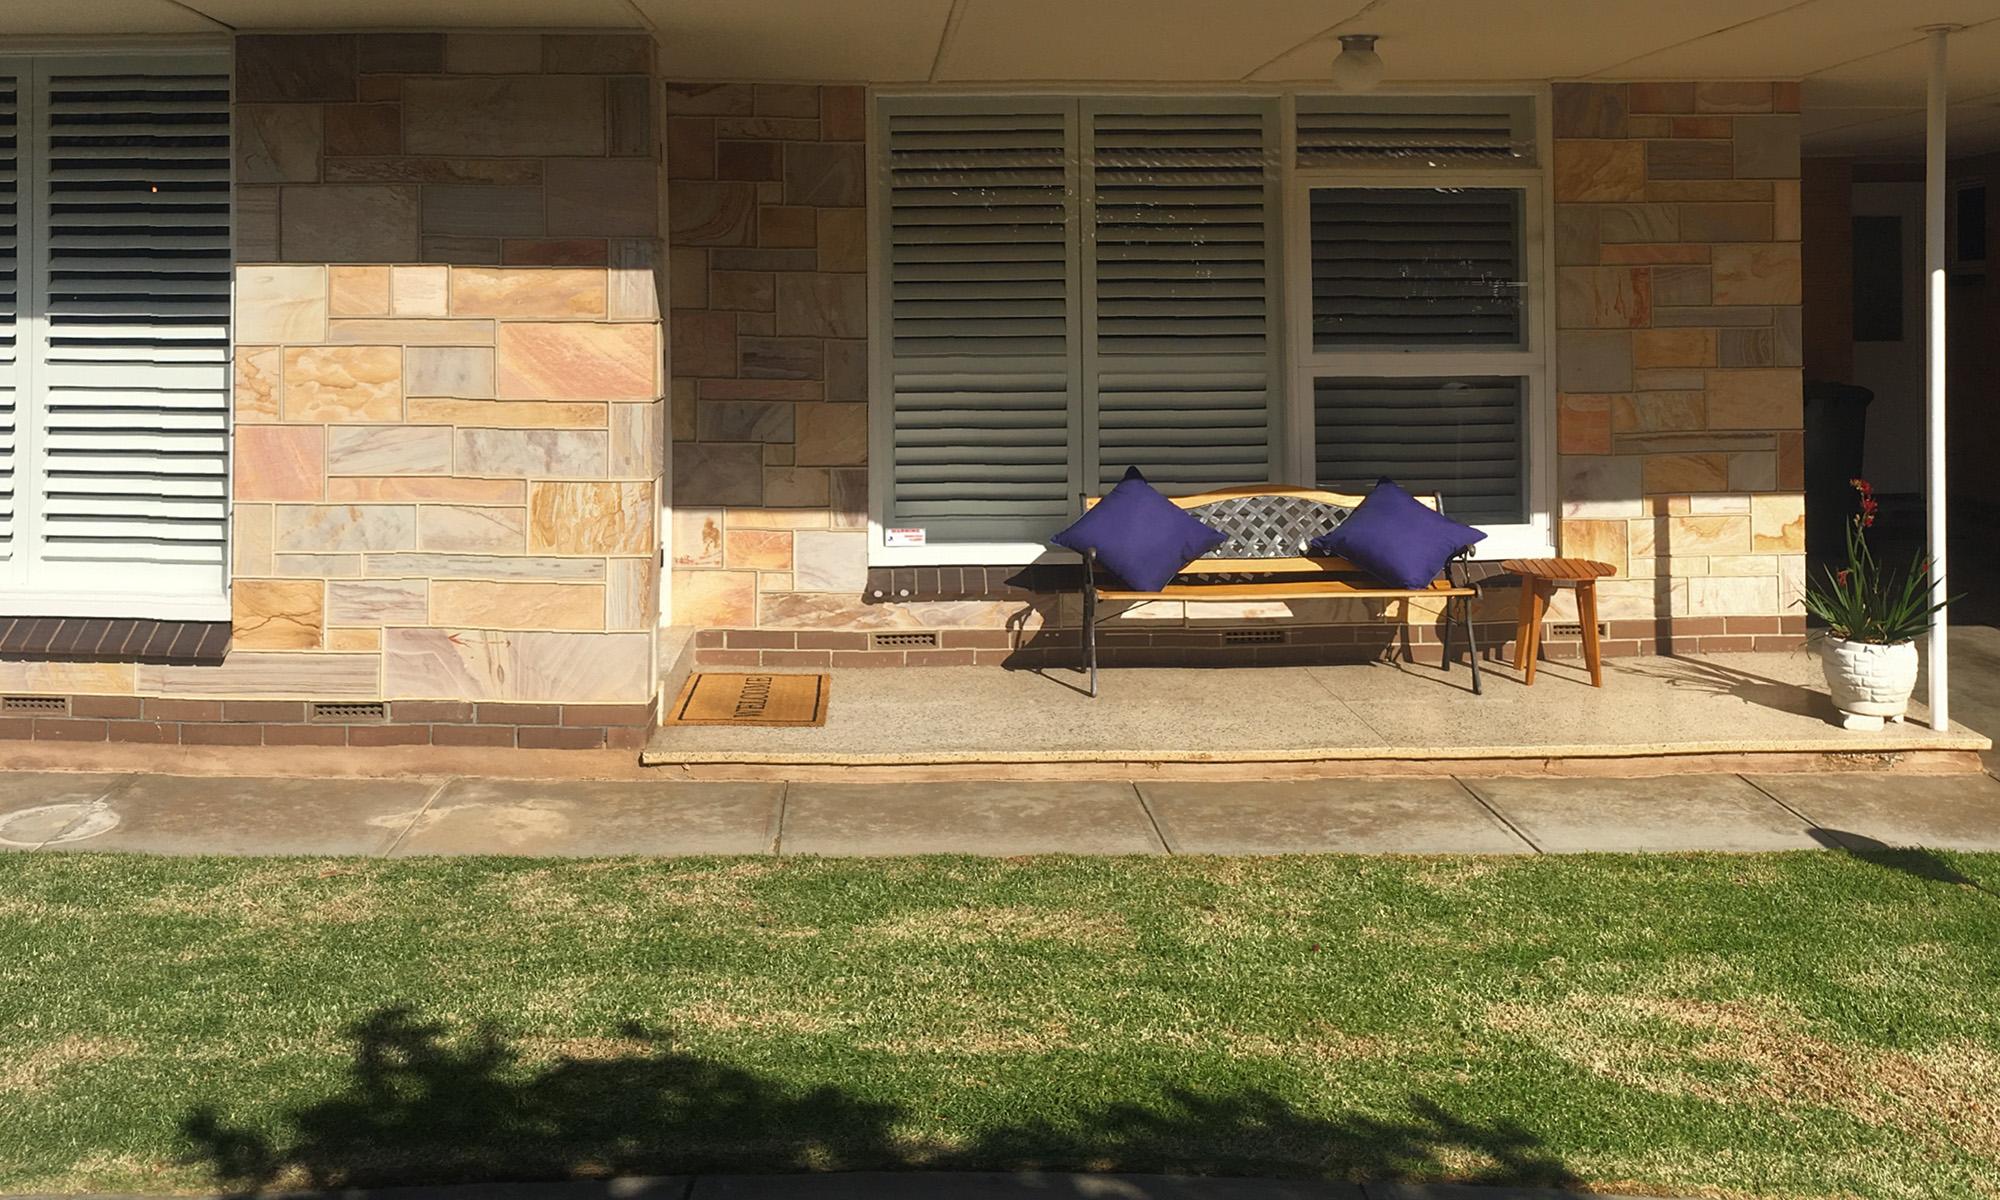 Adelaide beach holiday accommodation front verandah